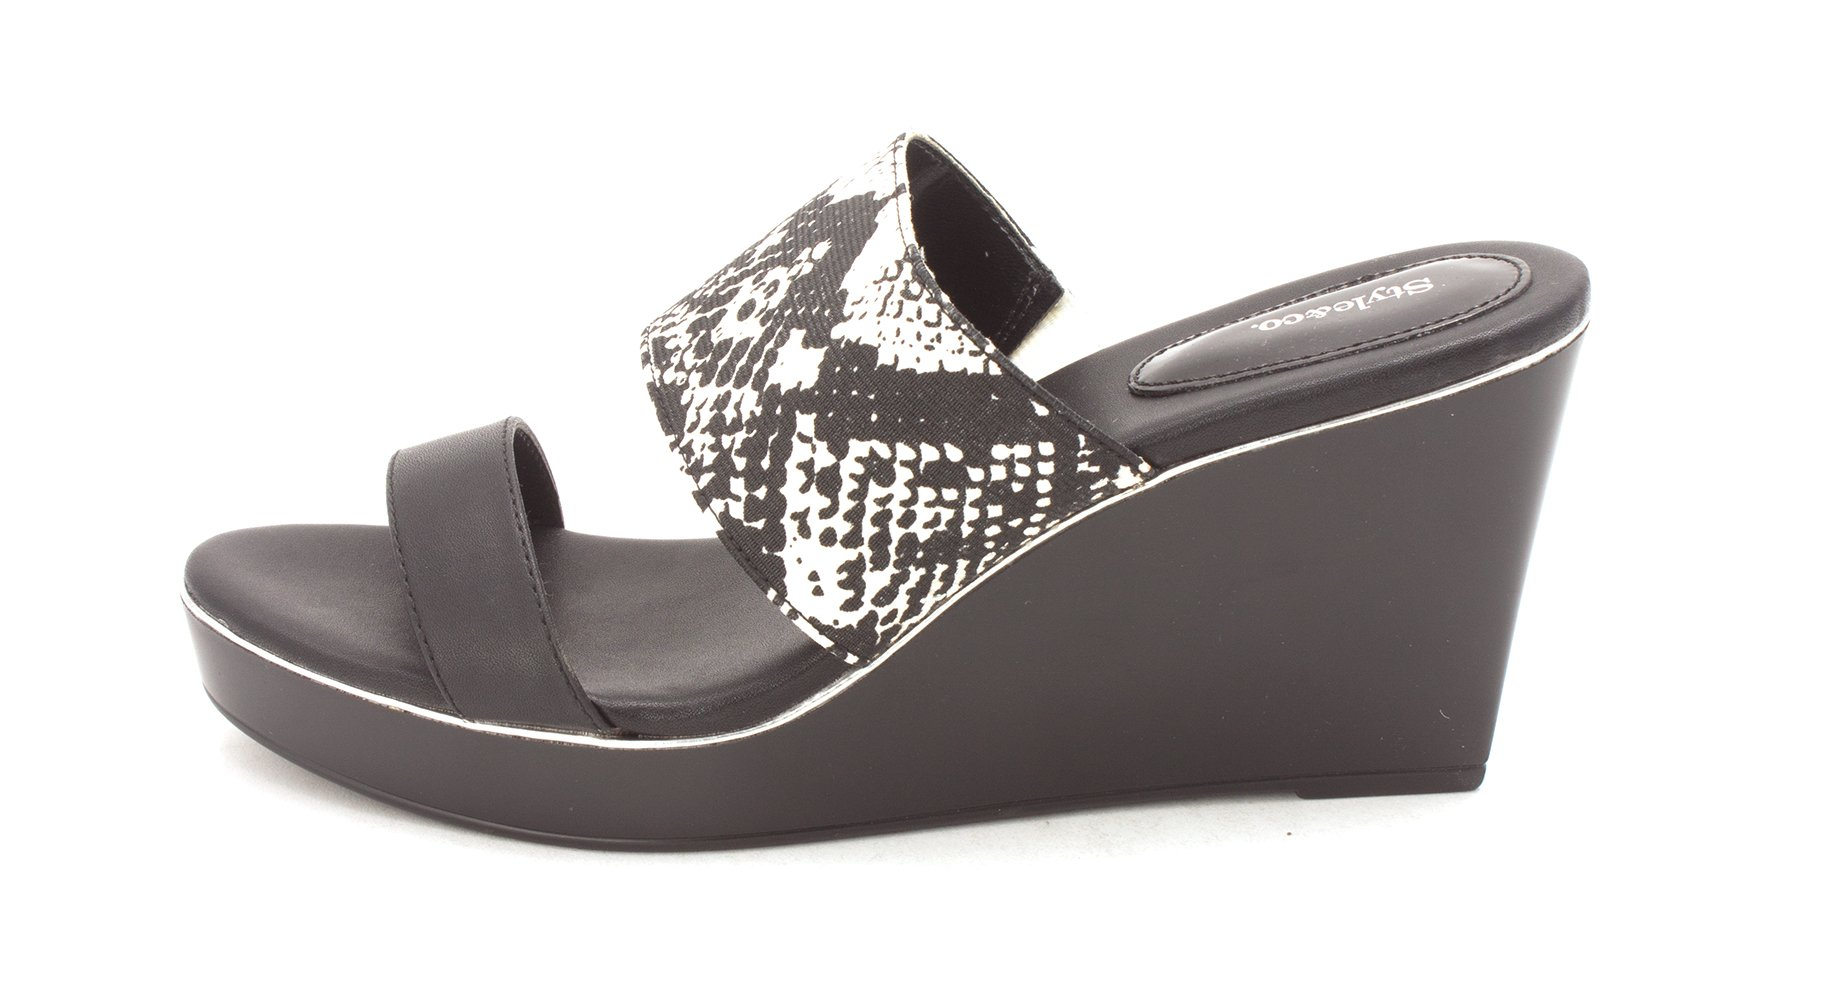 Style & Co. Women's Sandals & Flip Flop, Black Snake, Size 7.5